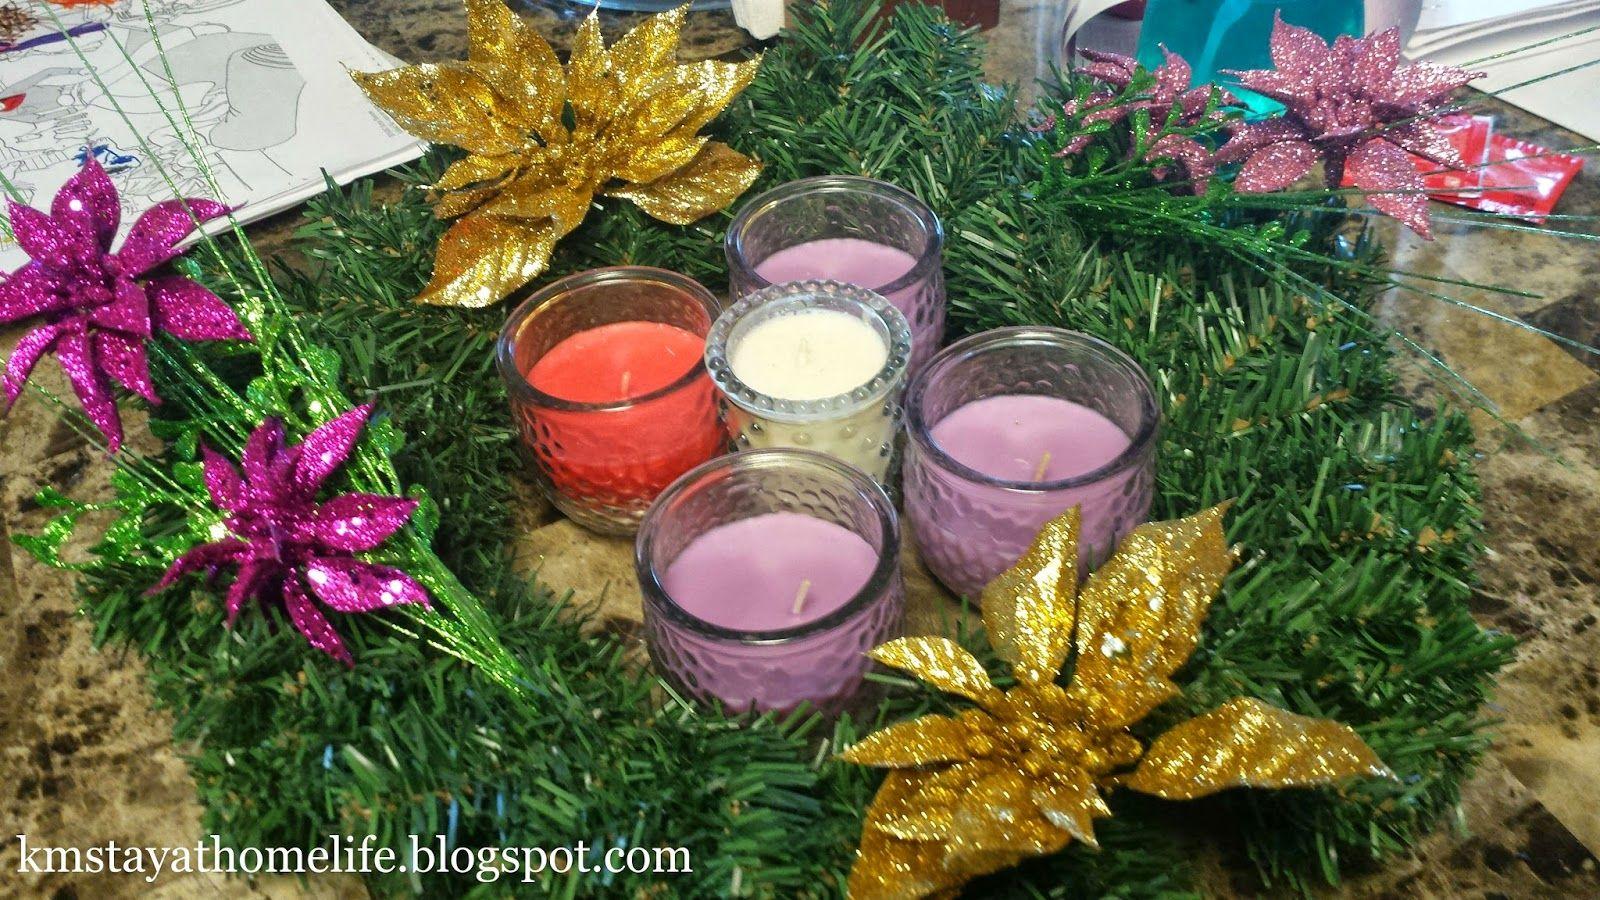 K&M The StayatHome Life DIY Catholic Advent Wreath